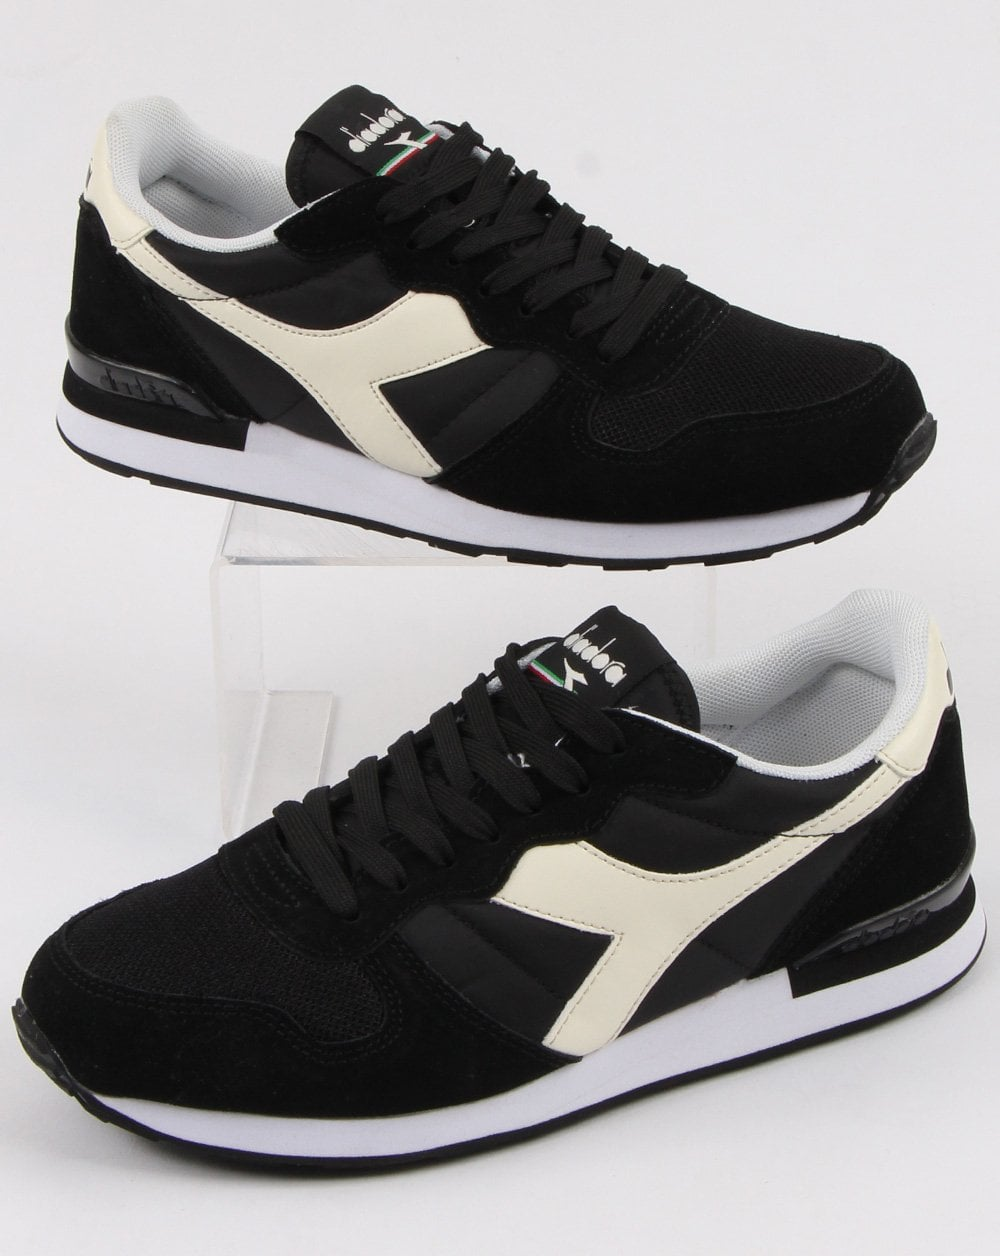 1c6d8c78e7 Diadora Camaro Trainers Black/white